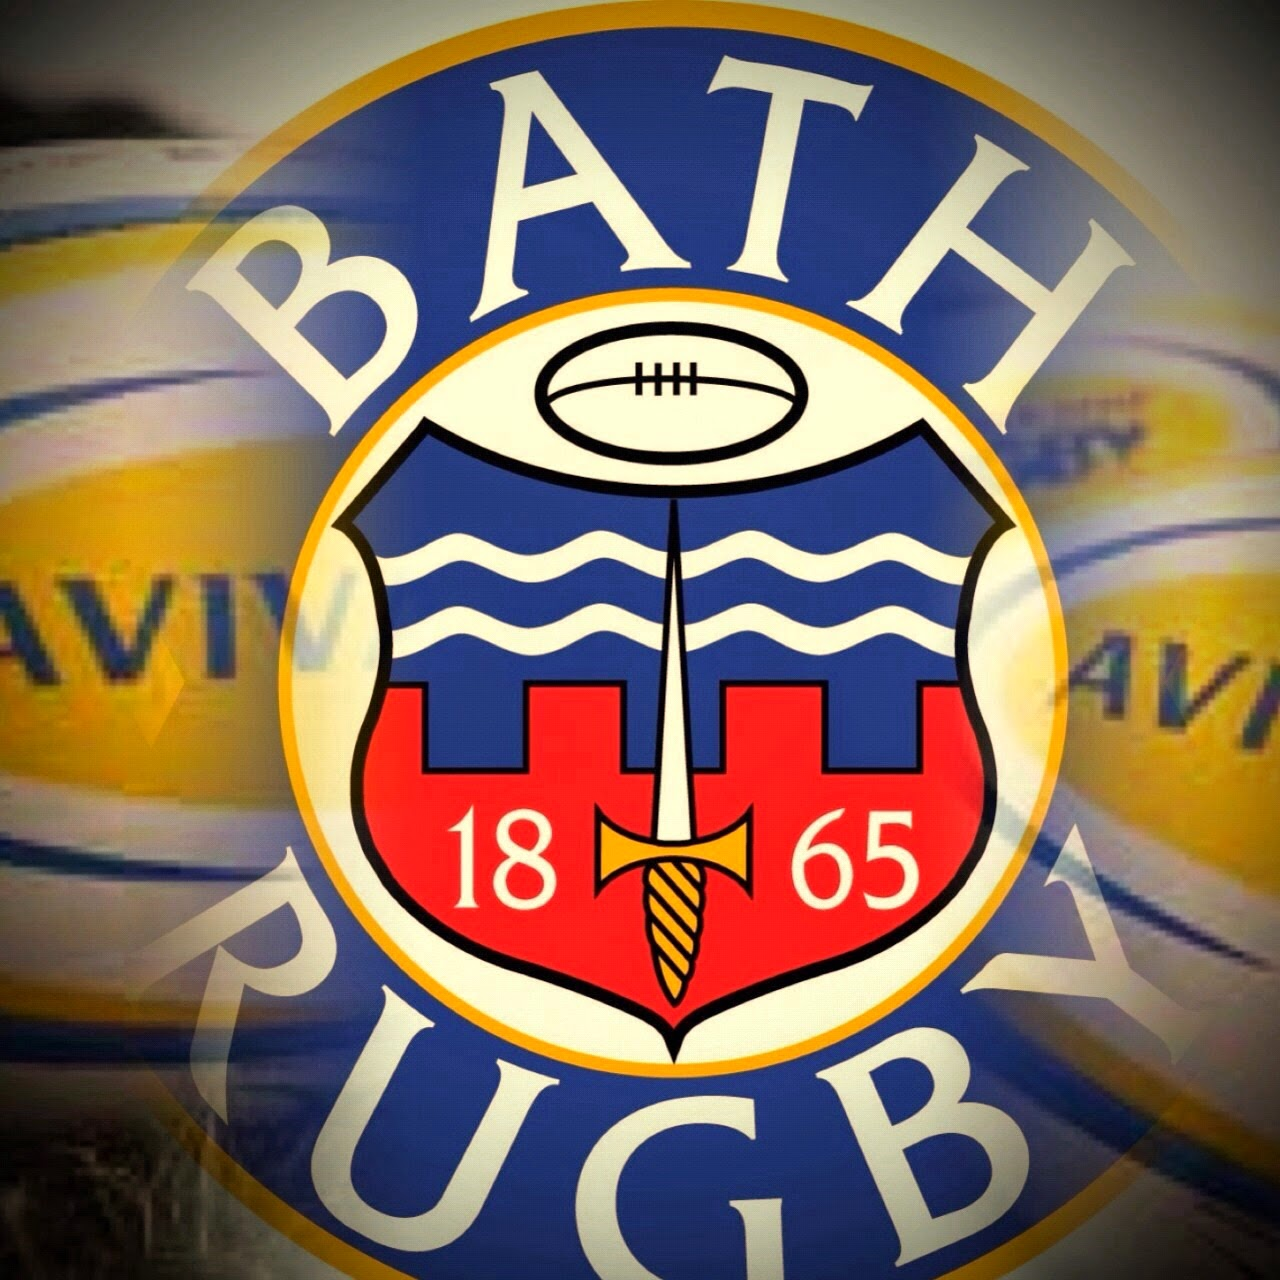 Bathbytes